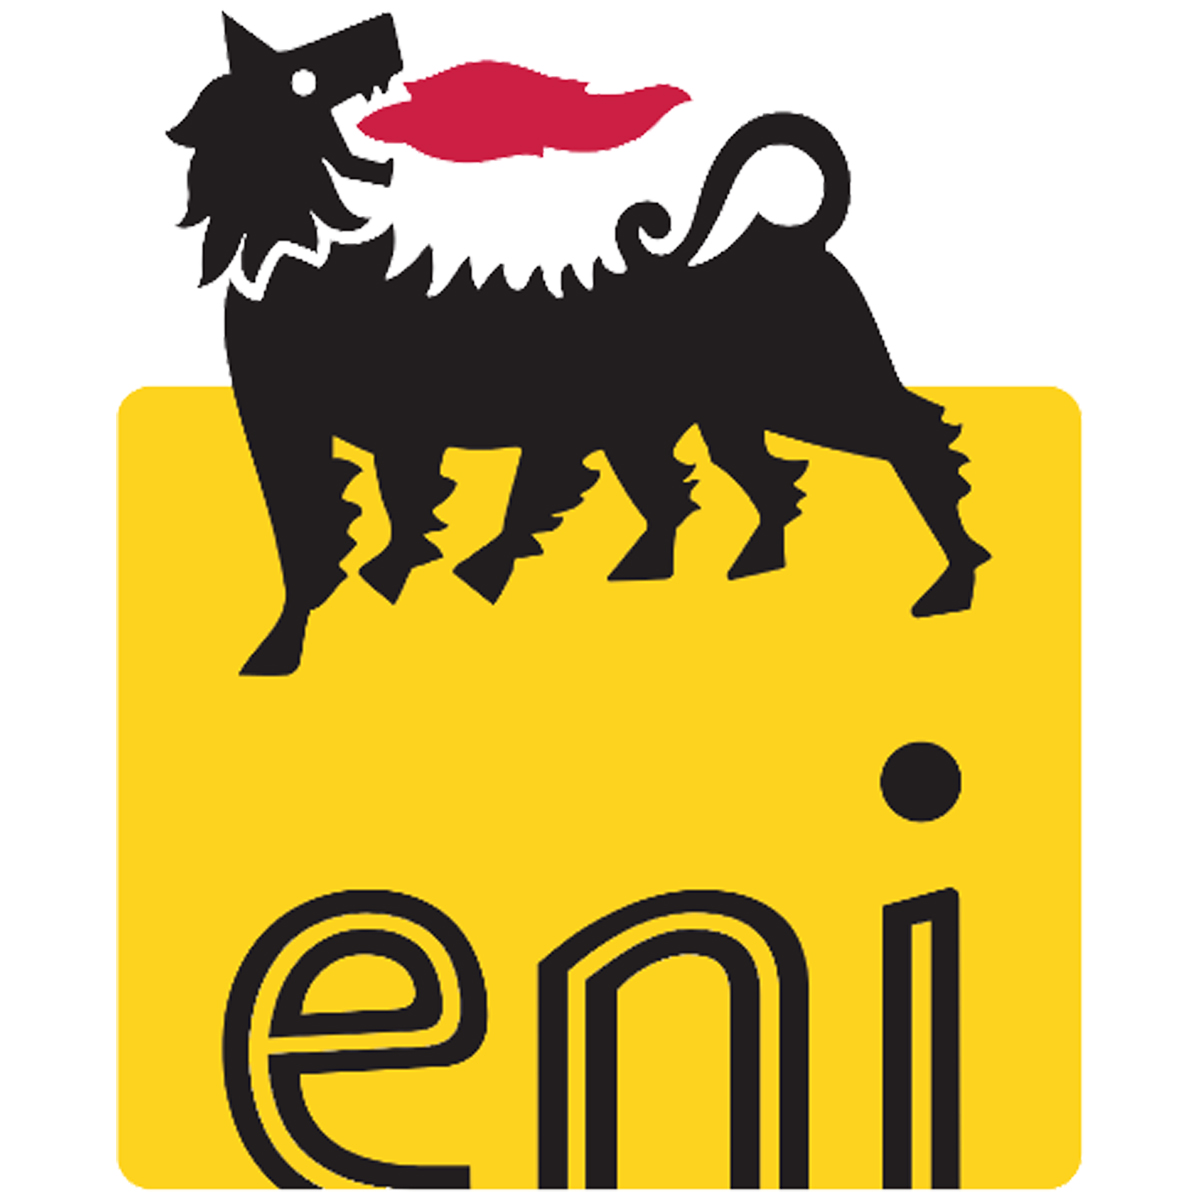 Eni: SCAM's Customer